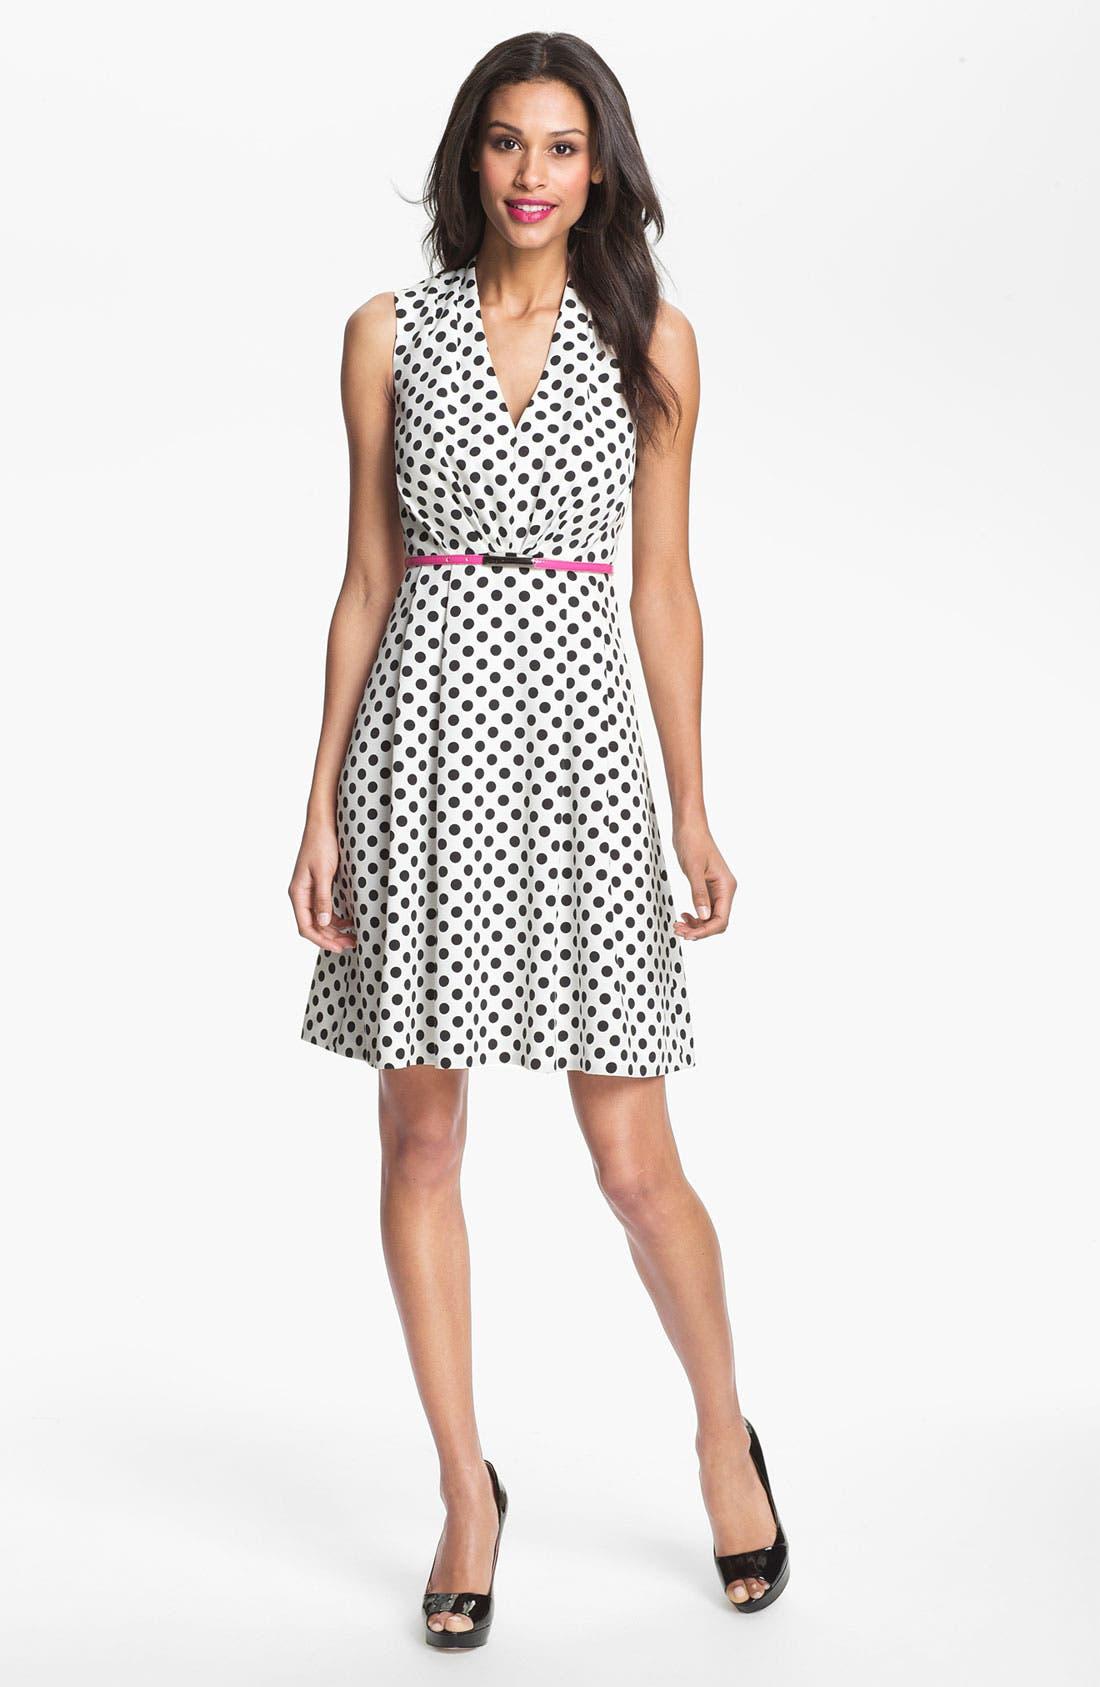 Main Image - Adrianna Papell Polka Dot Fit & Flare Dress